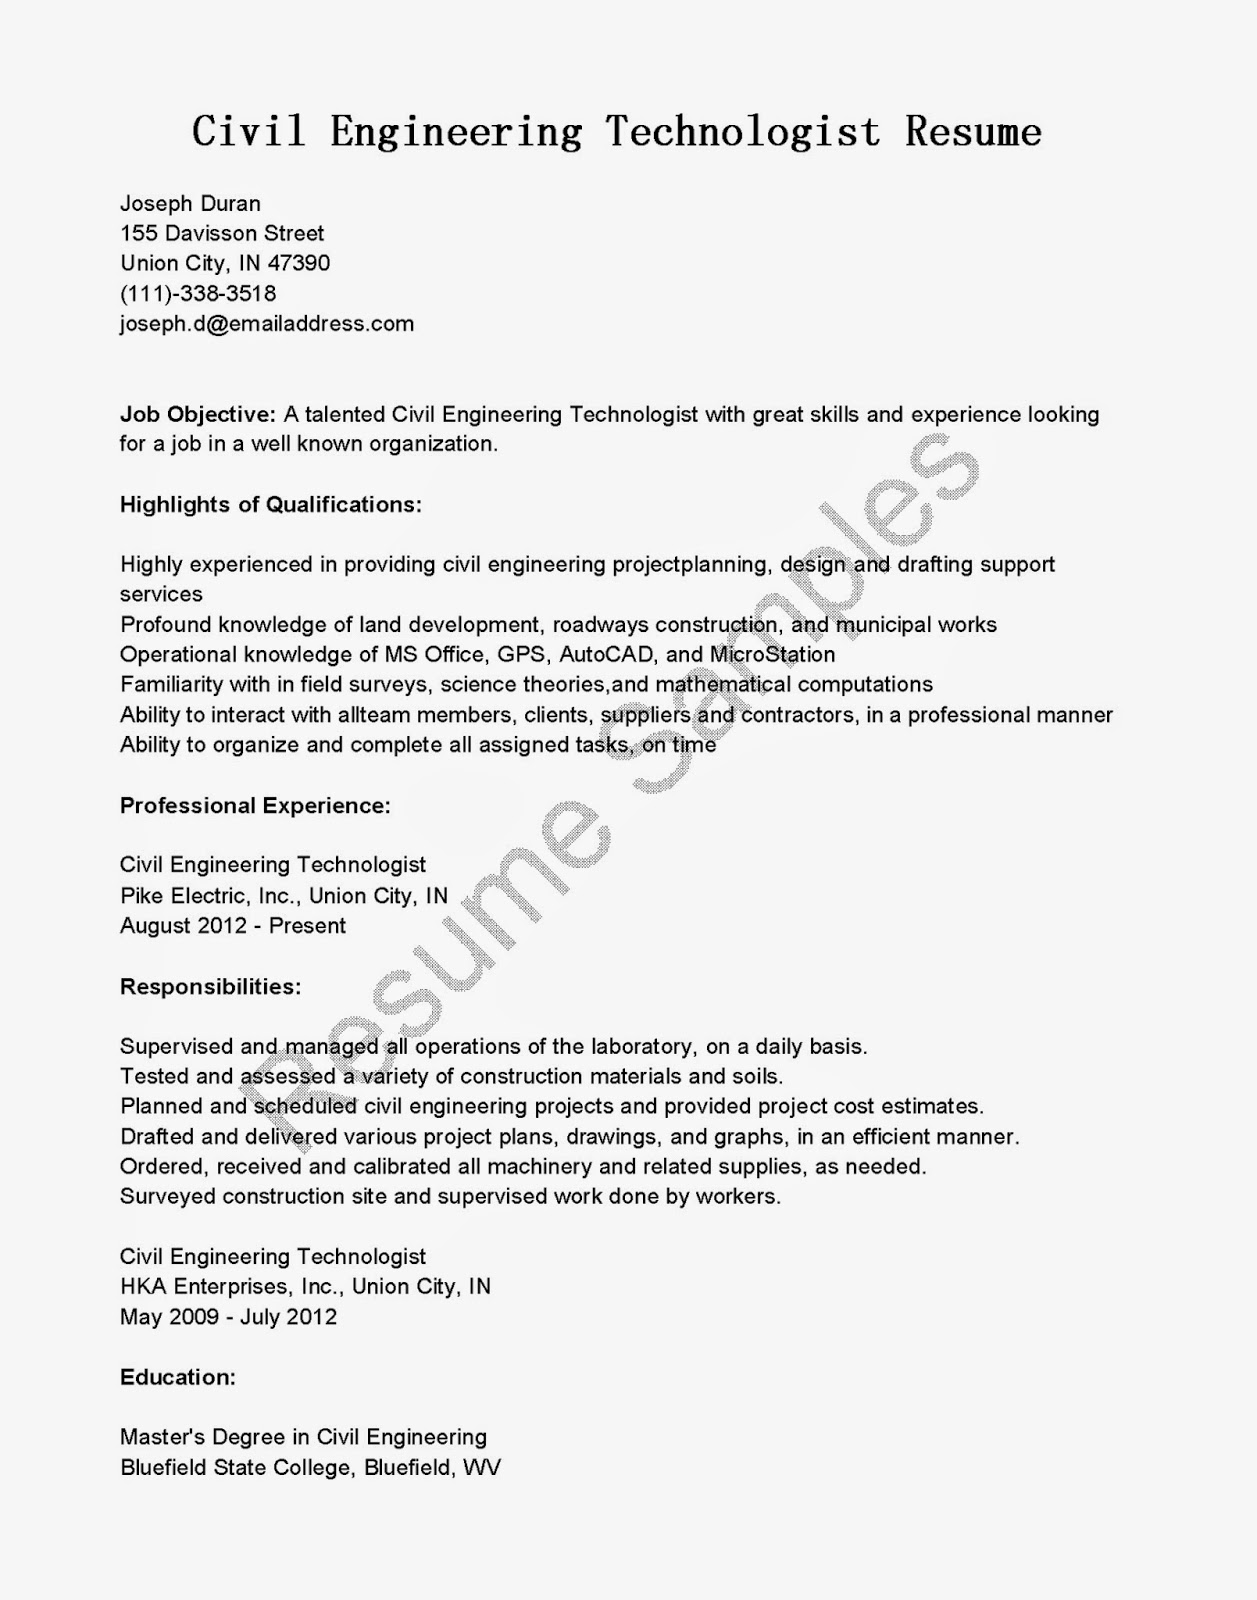 essays on engineering scholarship essay examples engineering  personal statement sample essays for cover letter prompt essay personal statement sample essays for personal statement